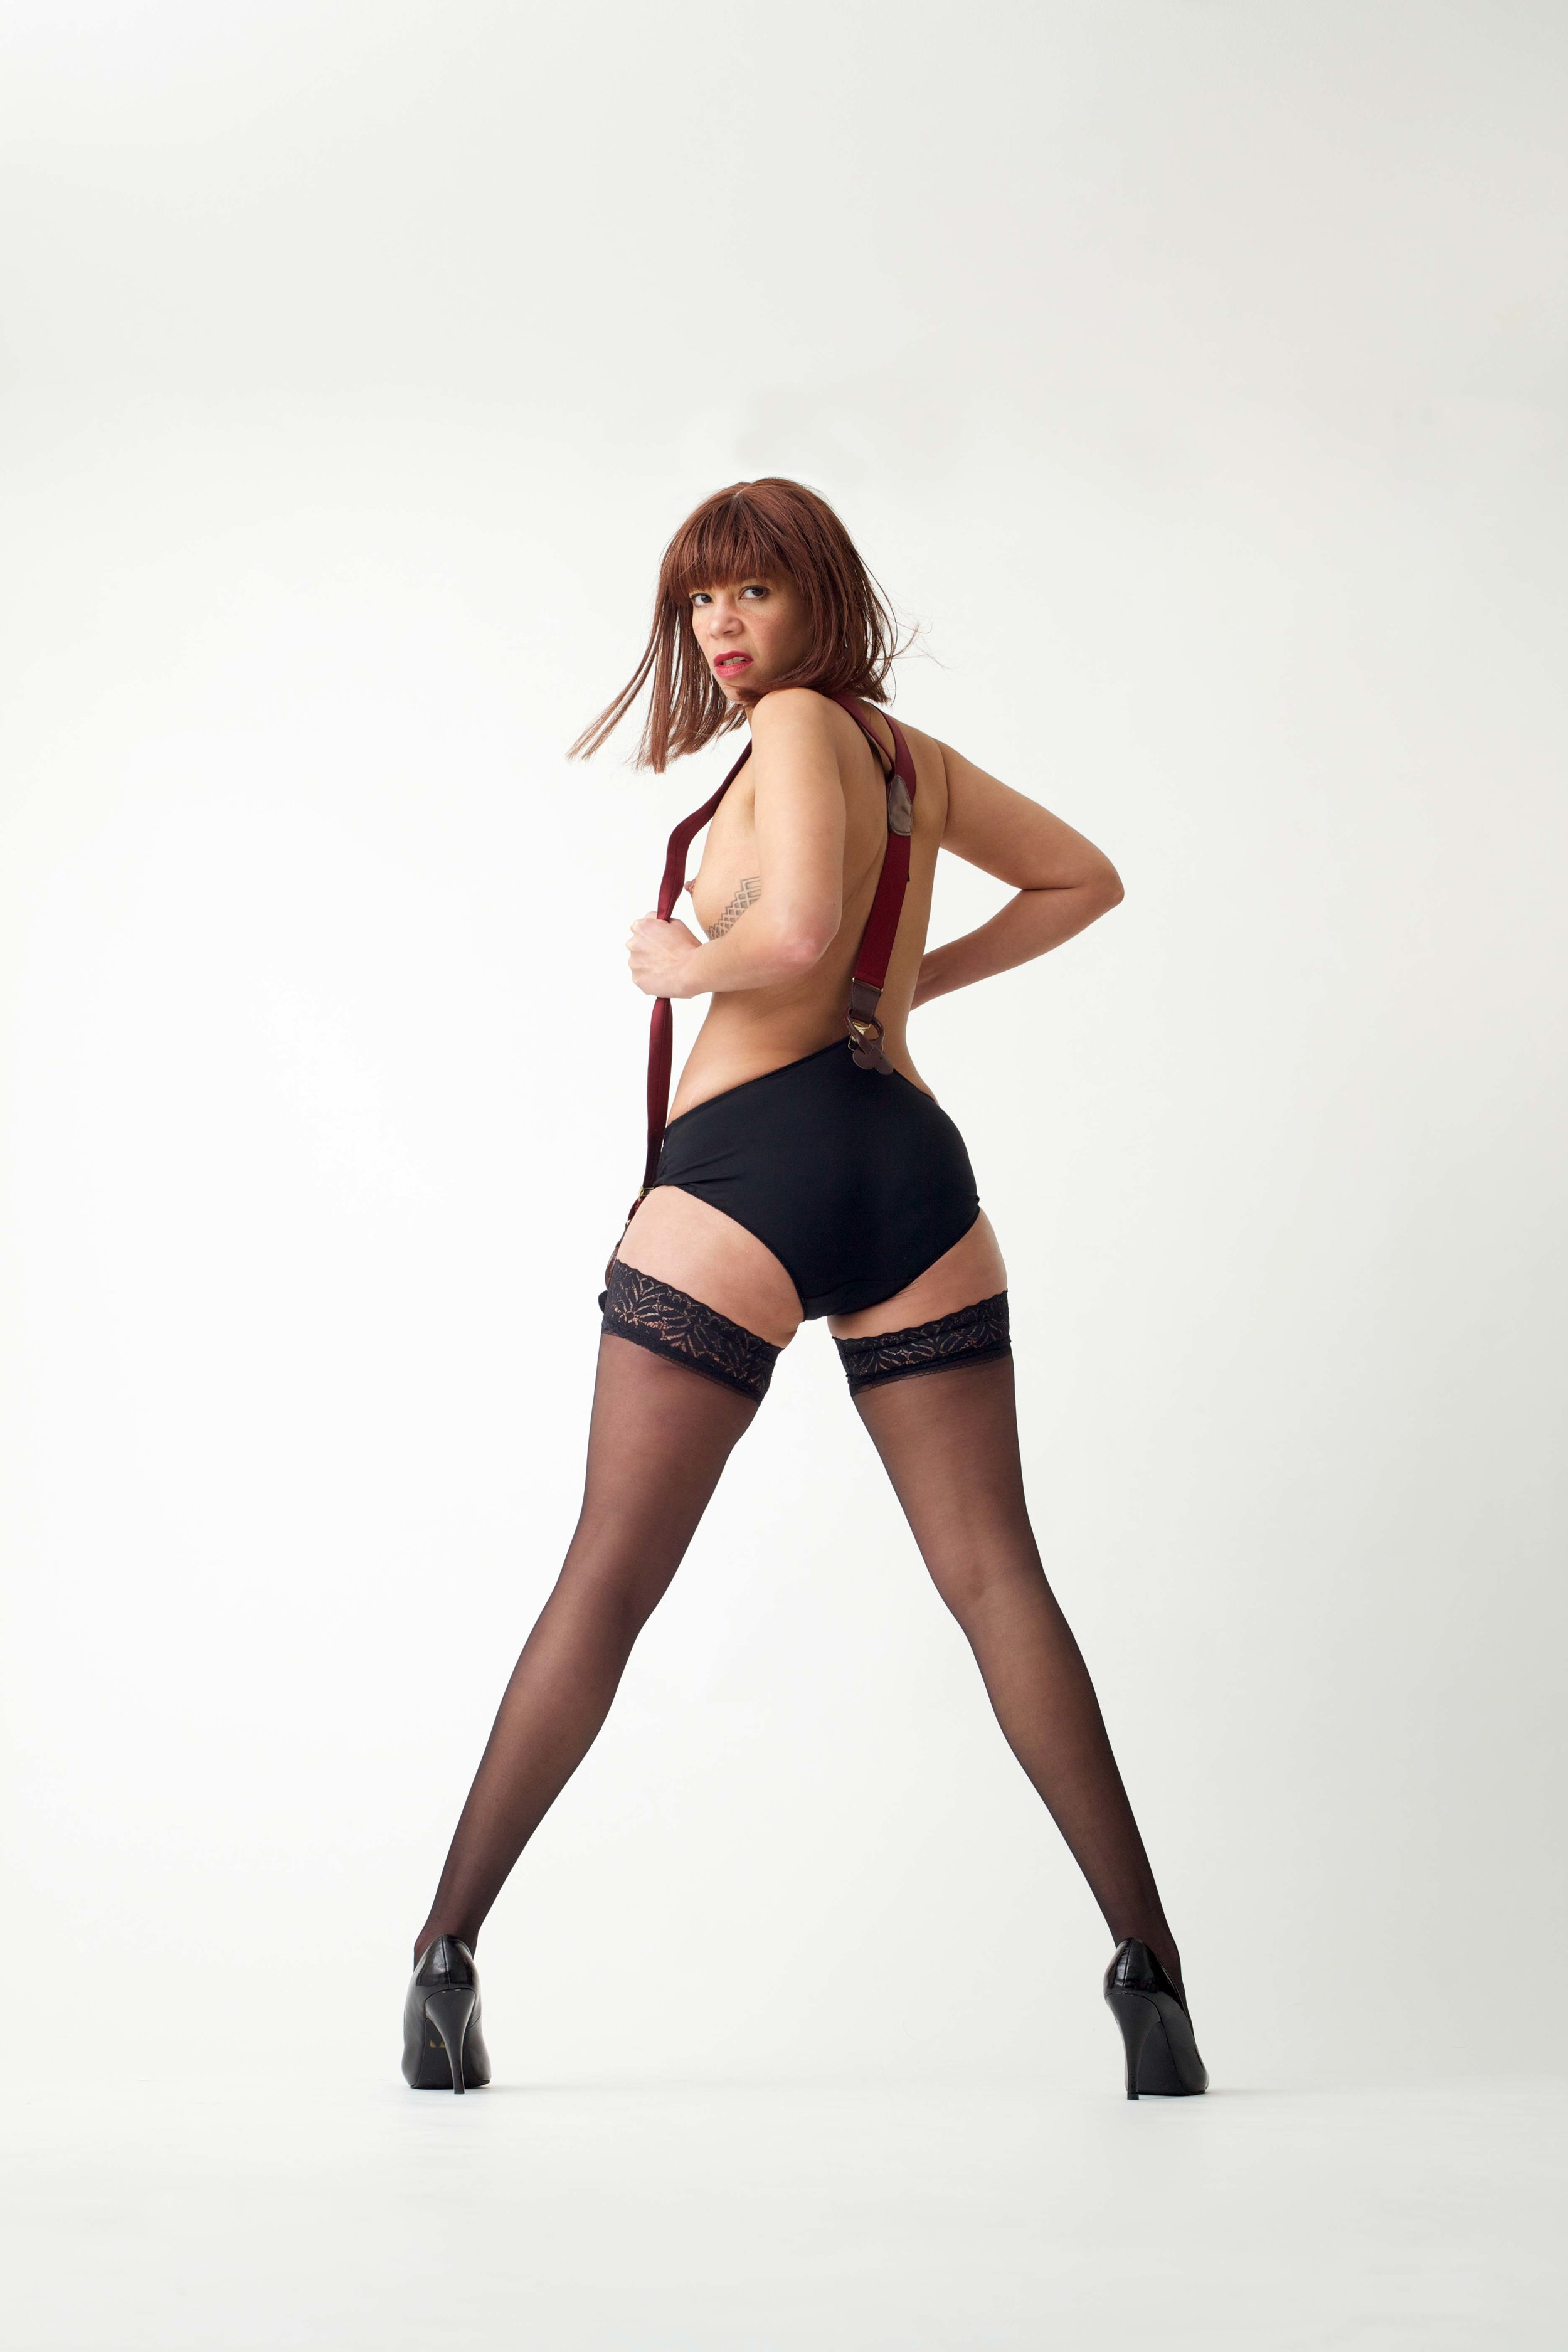 best-femdom-directory-london-mistress-sessions-like-backpage-for-london.jpg